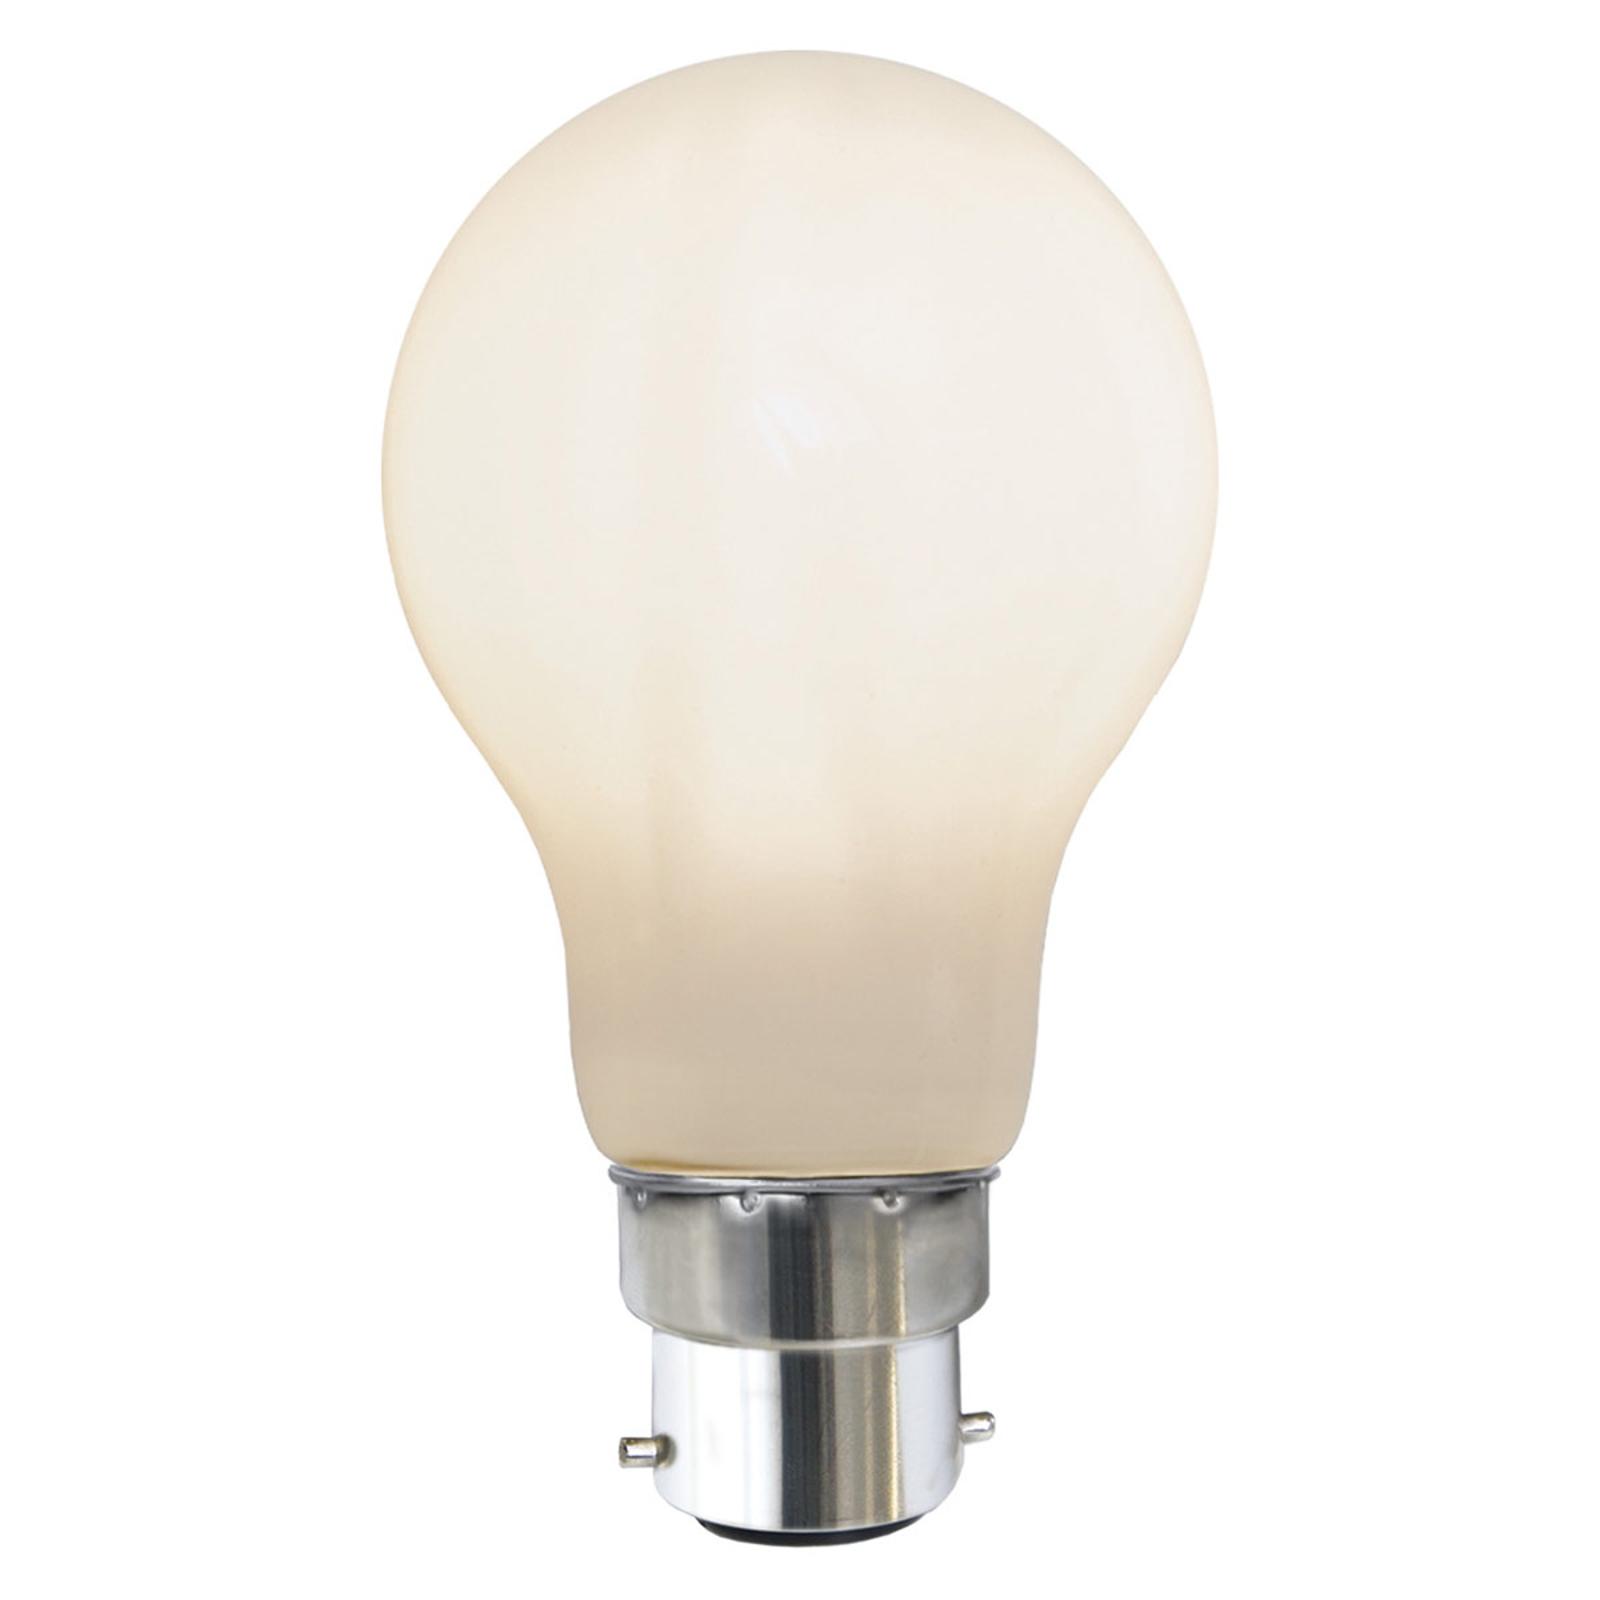 LED-Lampe B22 7,5W 2.700K Ra90 opal